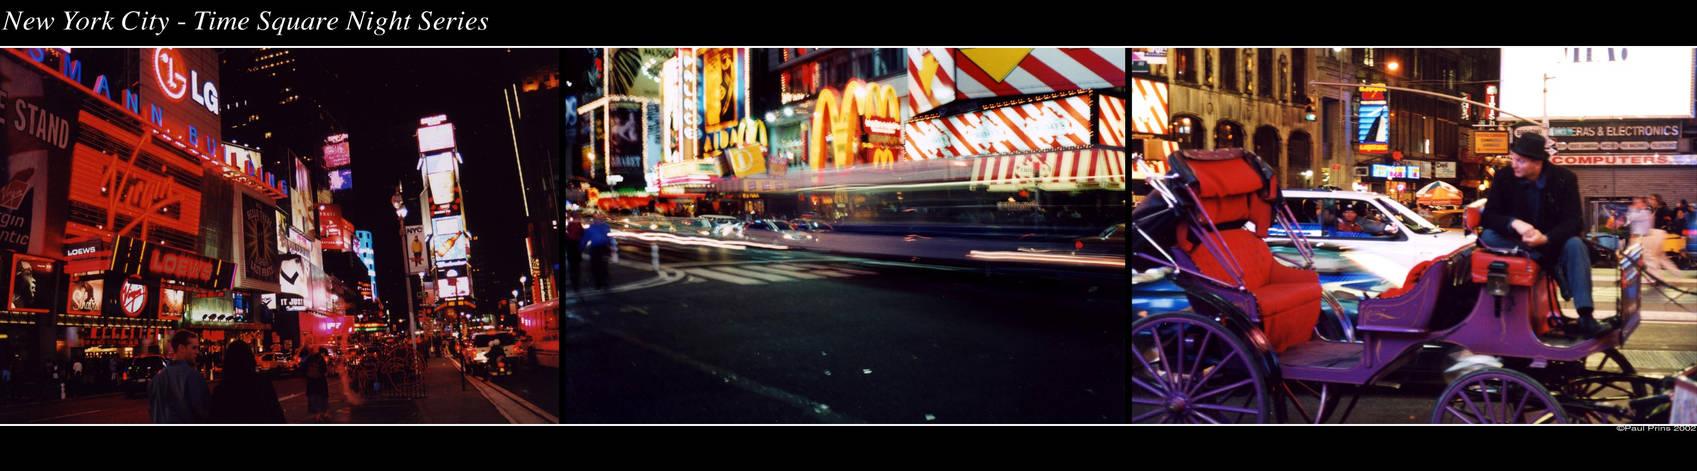 NYC - Time Square Night Series